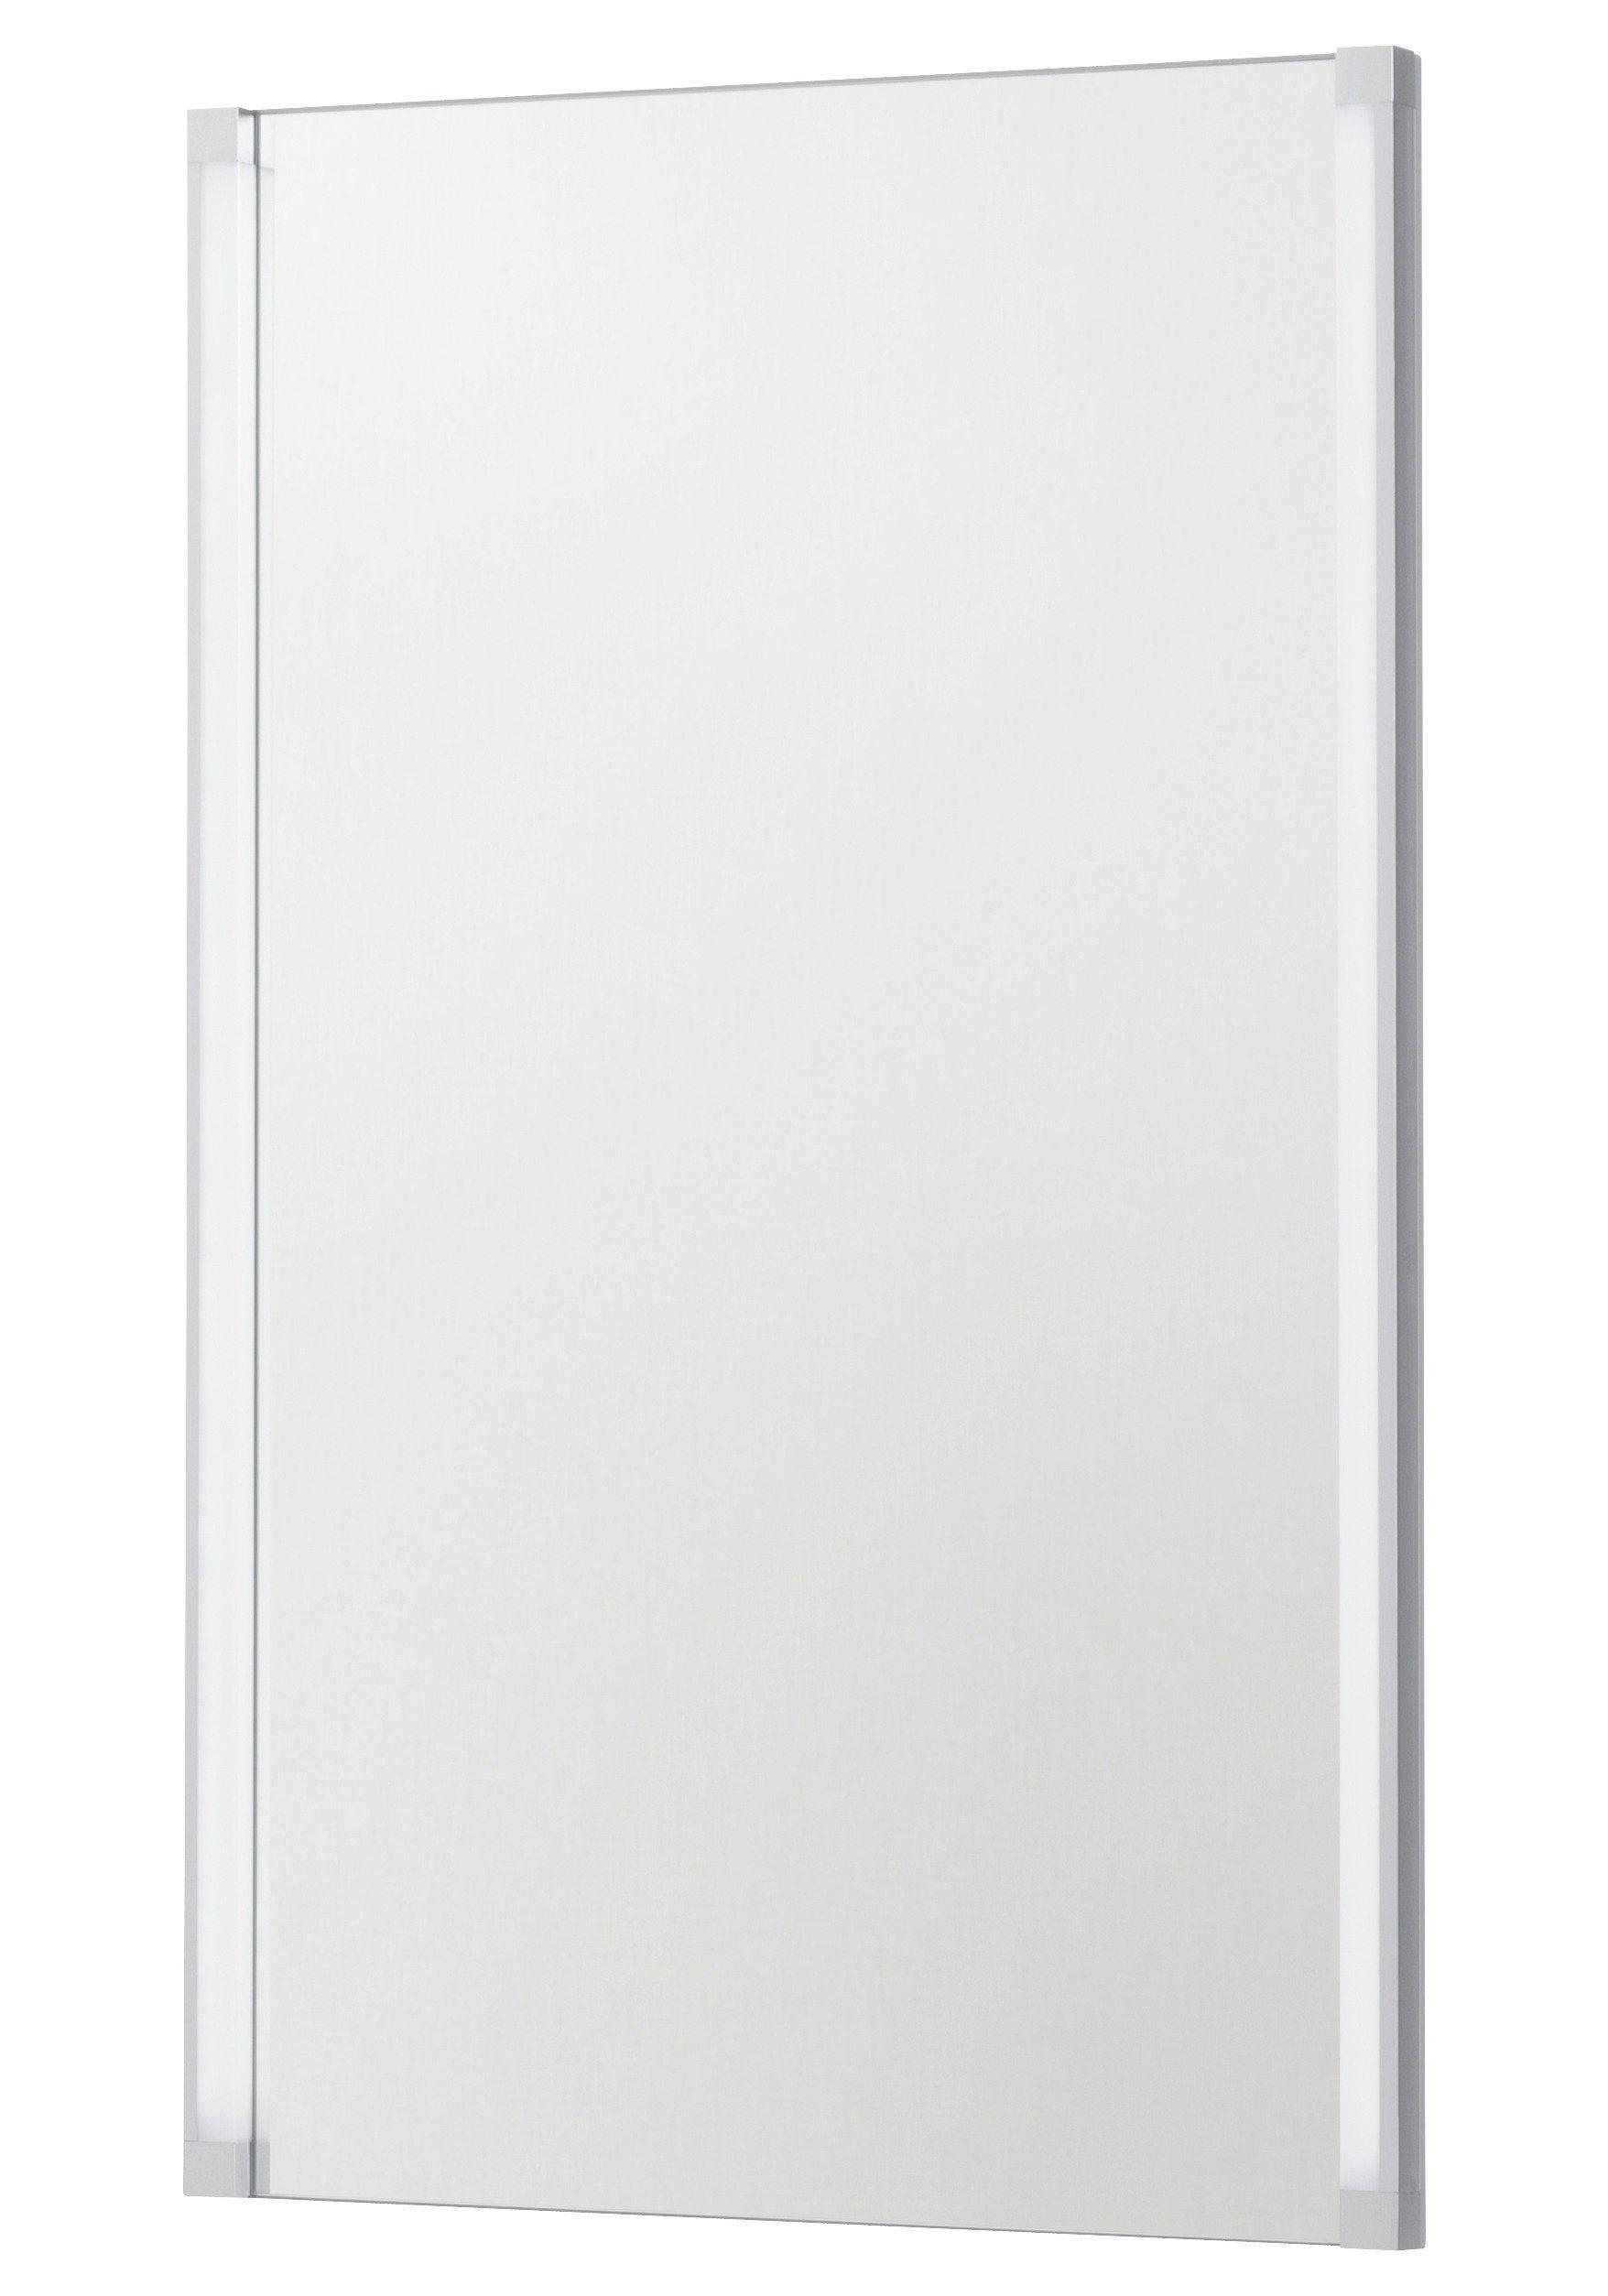 FACKELMANN Spiegel LED LINE Breite 42 5 cm